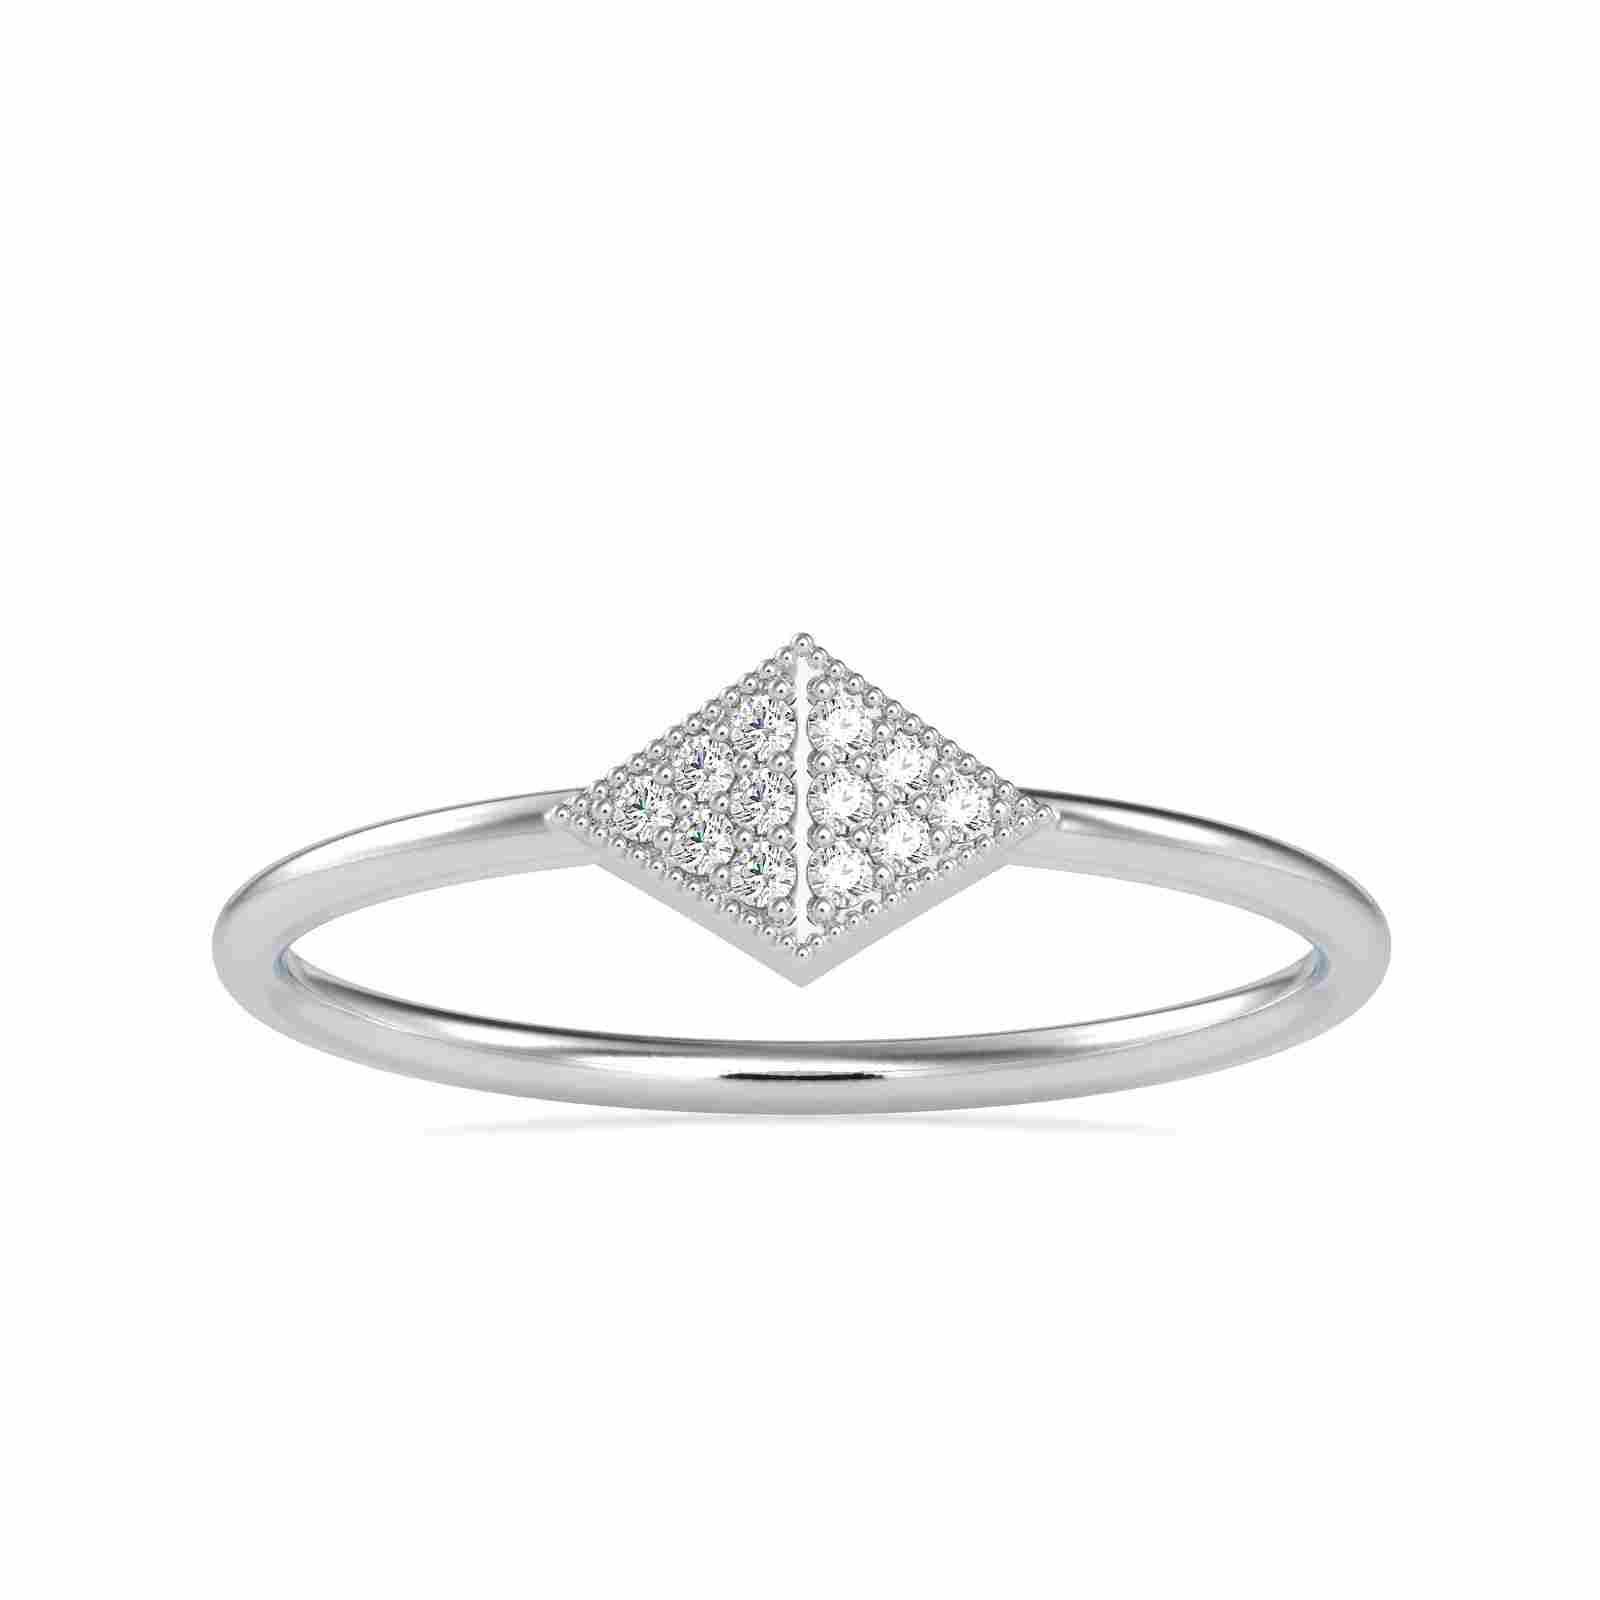 0.045CT Natural Diamond 14K White Gold Ring